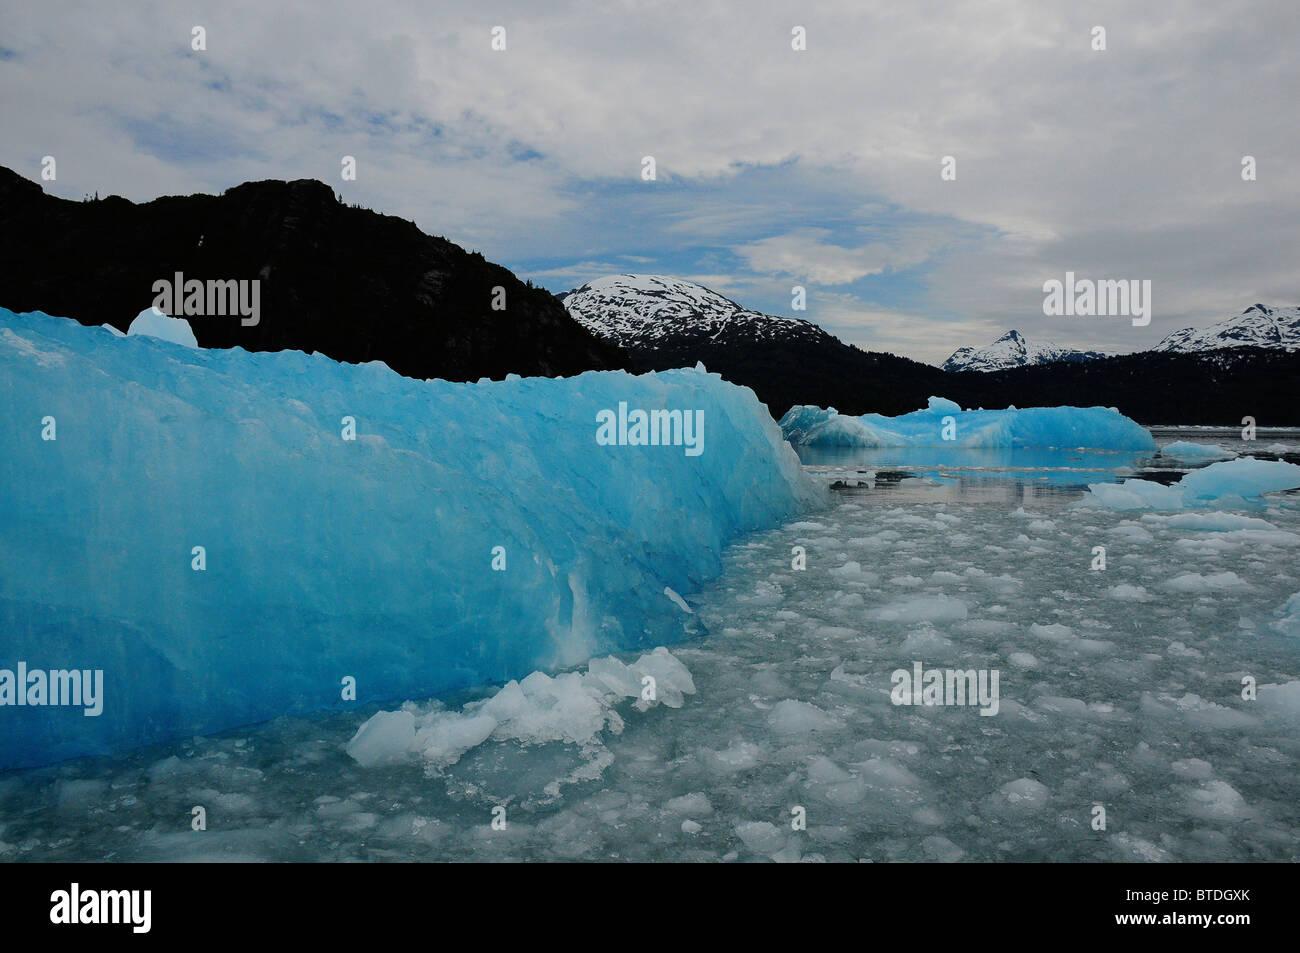 A Large iceberg drifts away from Chenega Glacier on an overcast day, Prince William Sound, Kenai Peninsula, Alaska, - Stock Image